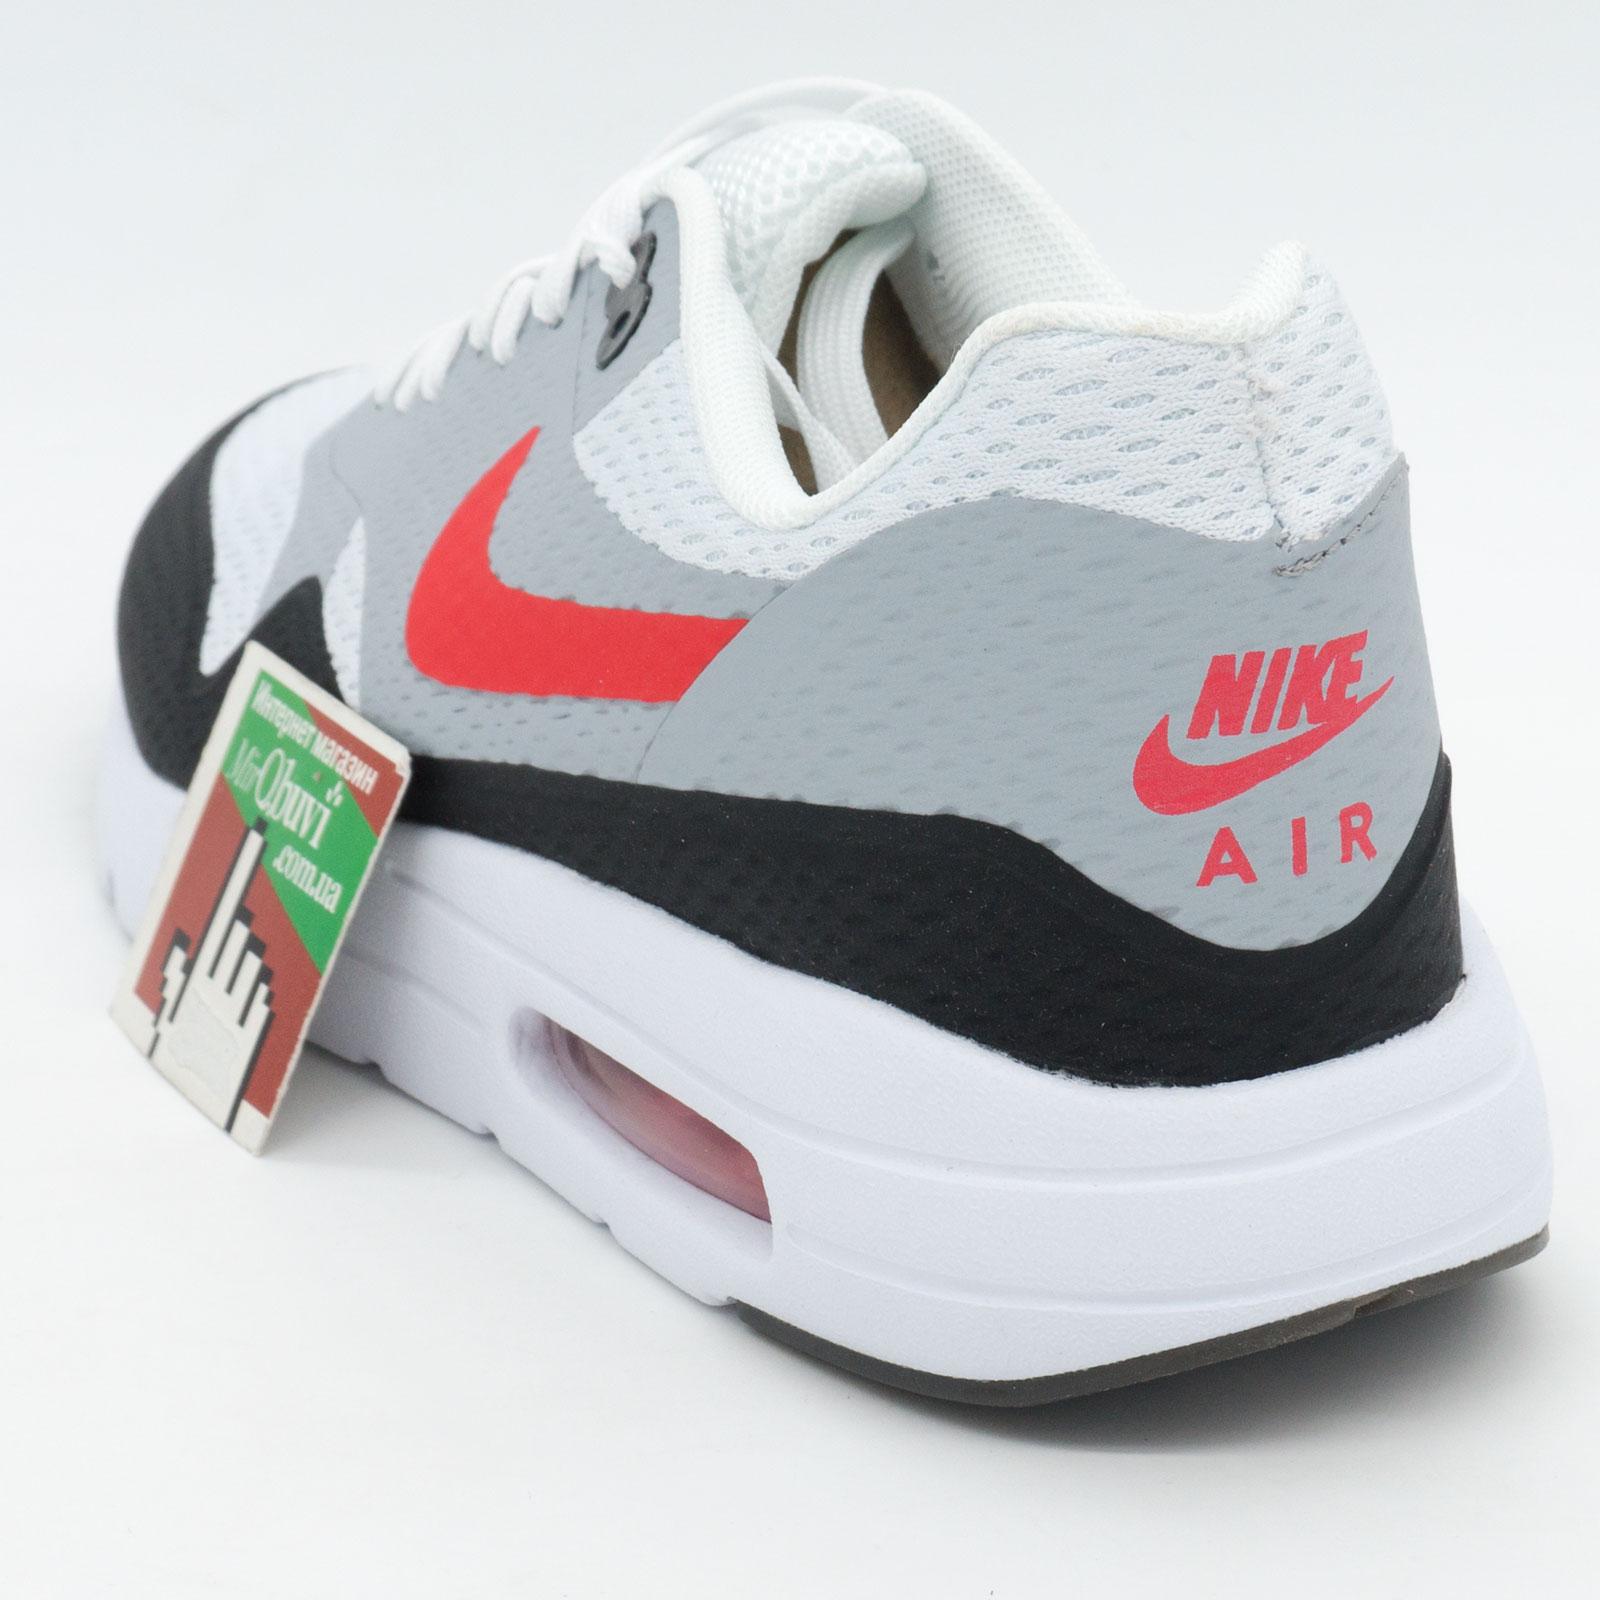 фото back Мужские кроссовки Nike air max Ultra Flyknit серые с красным back